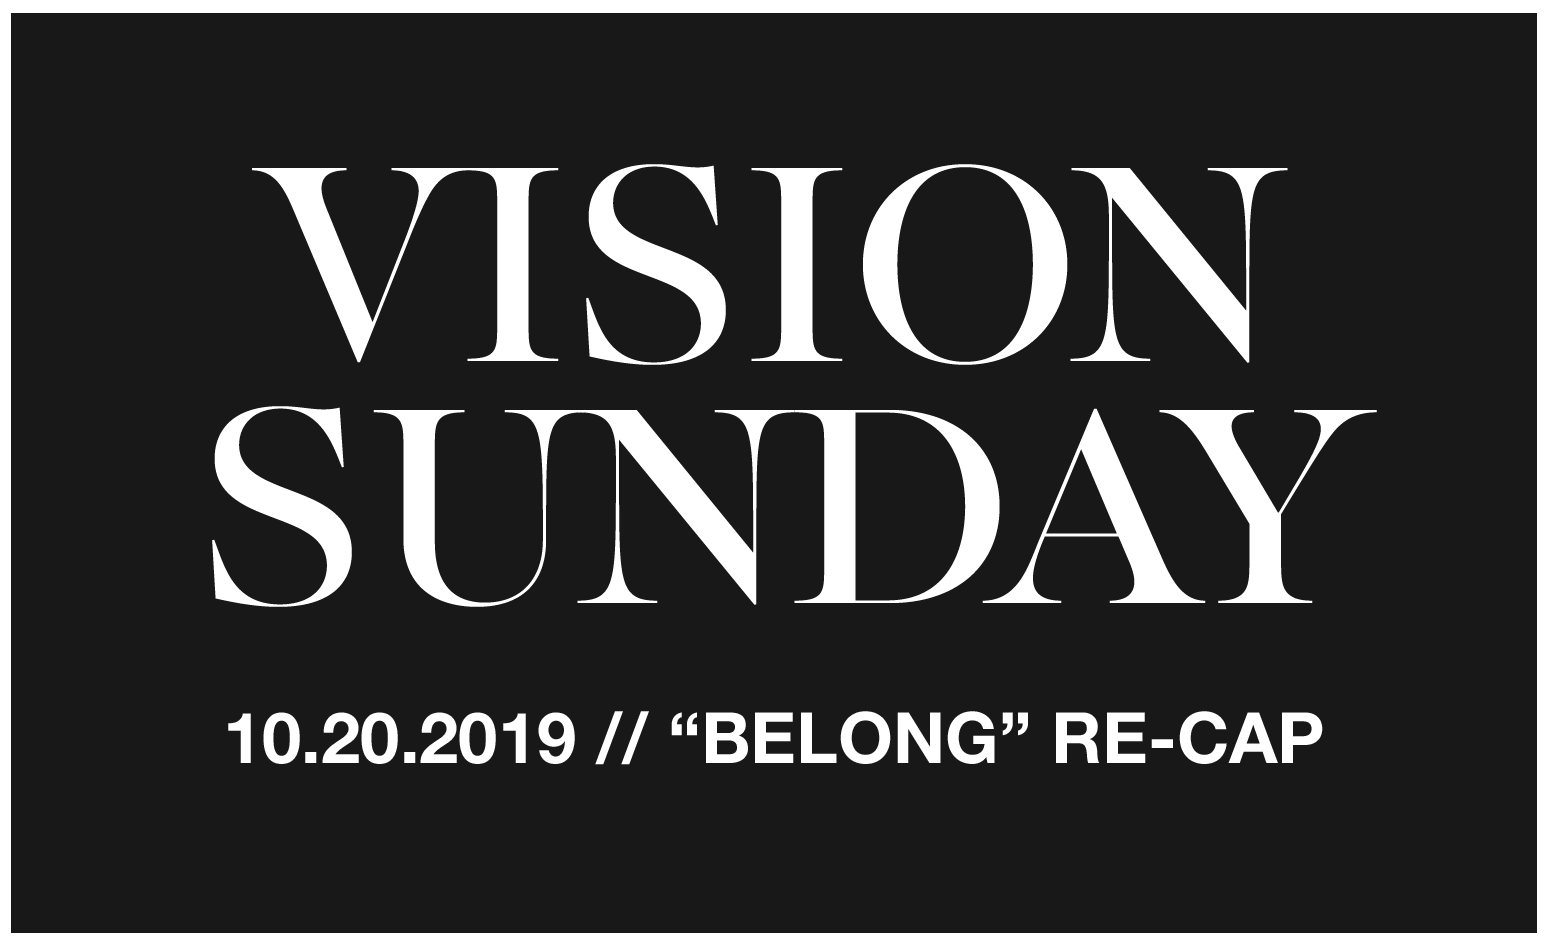 visionsundaylogo copy.png